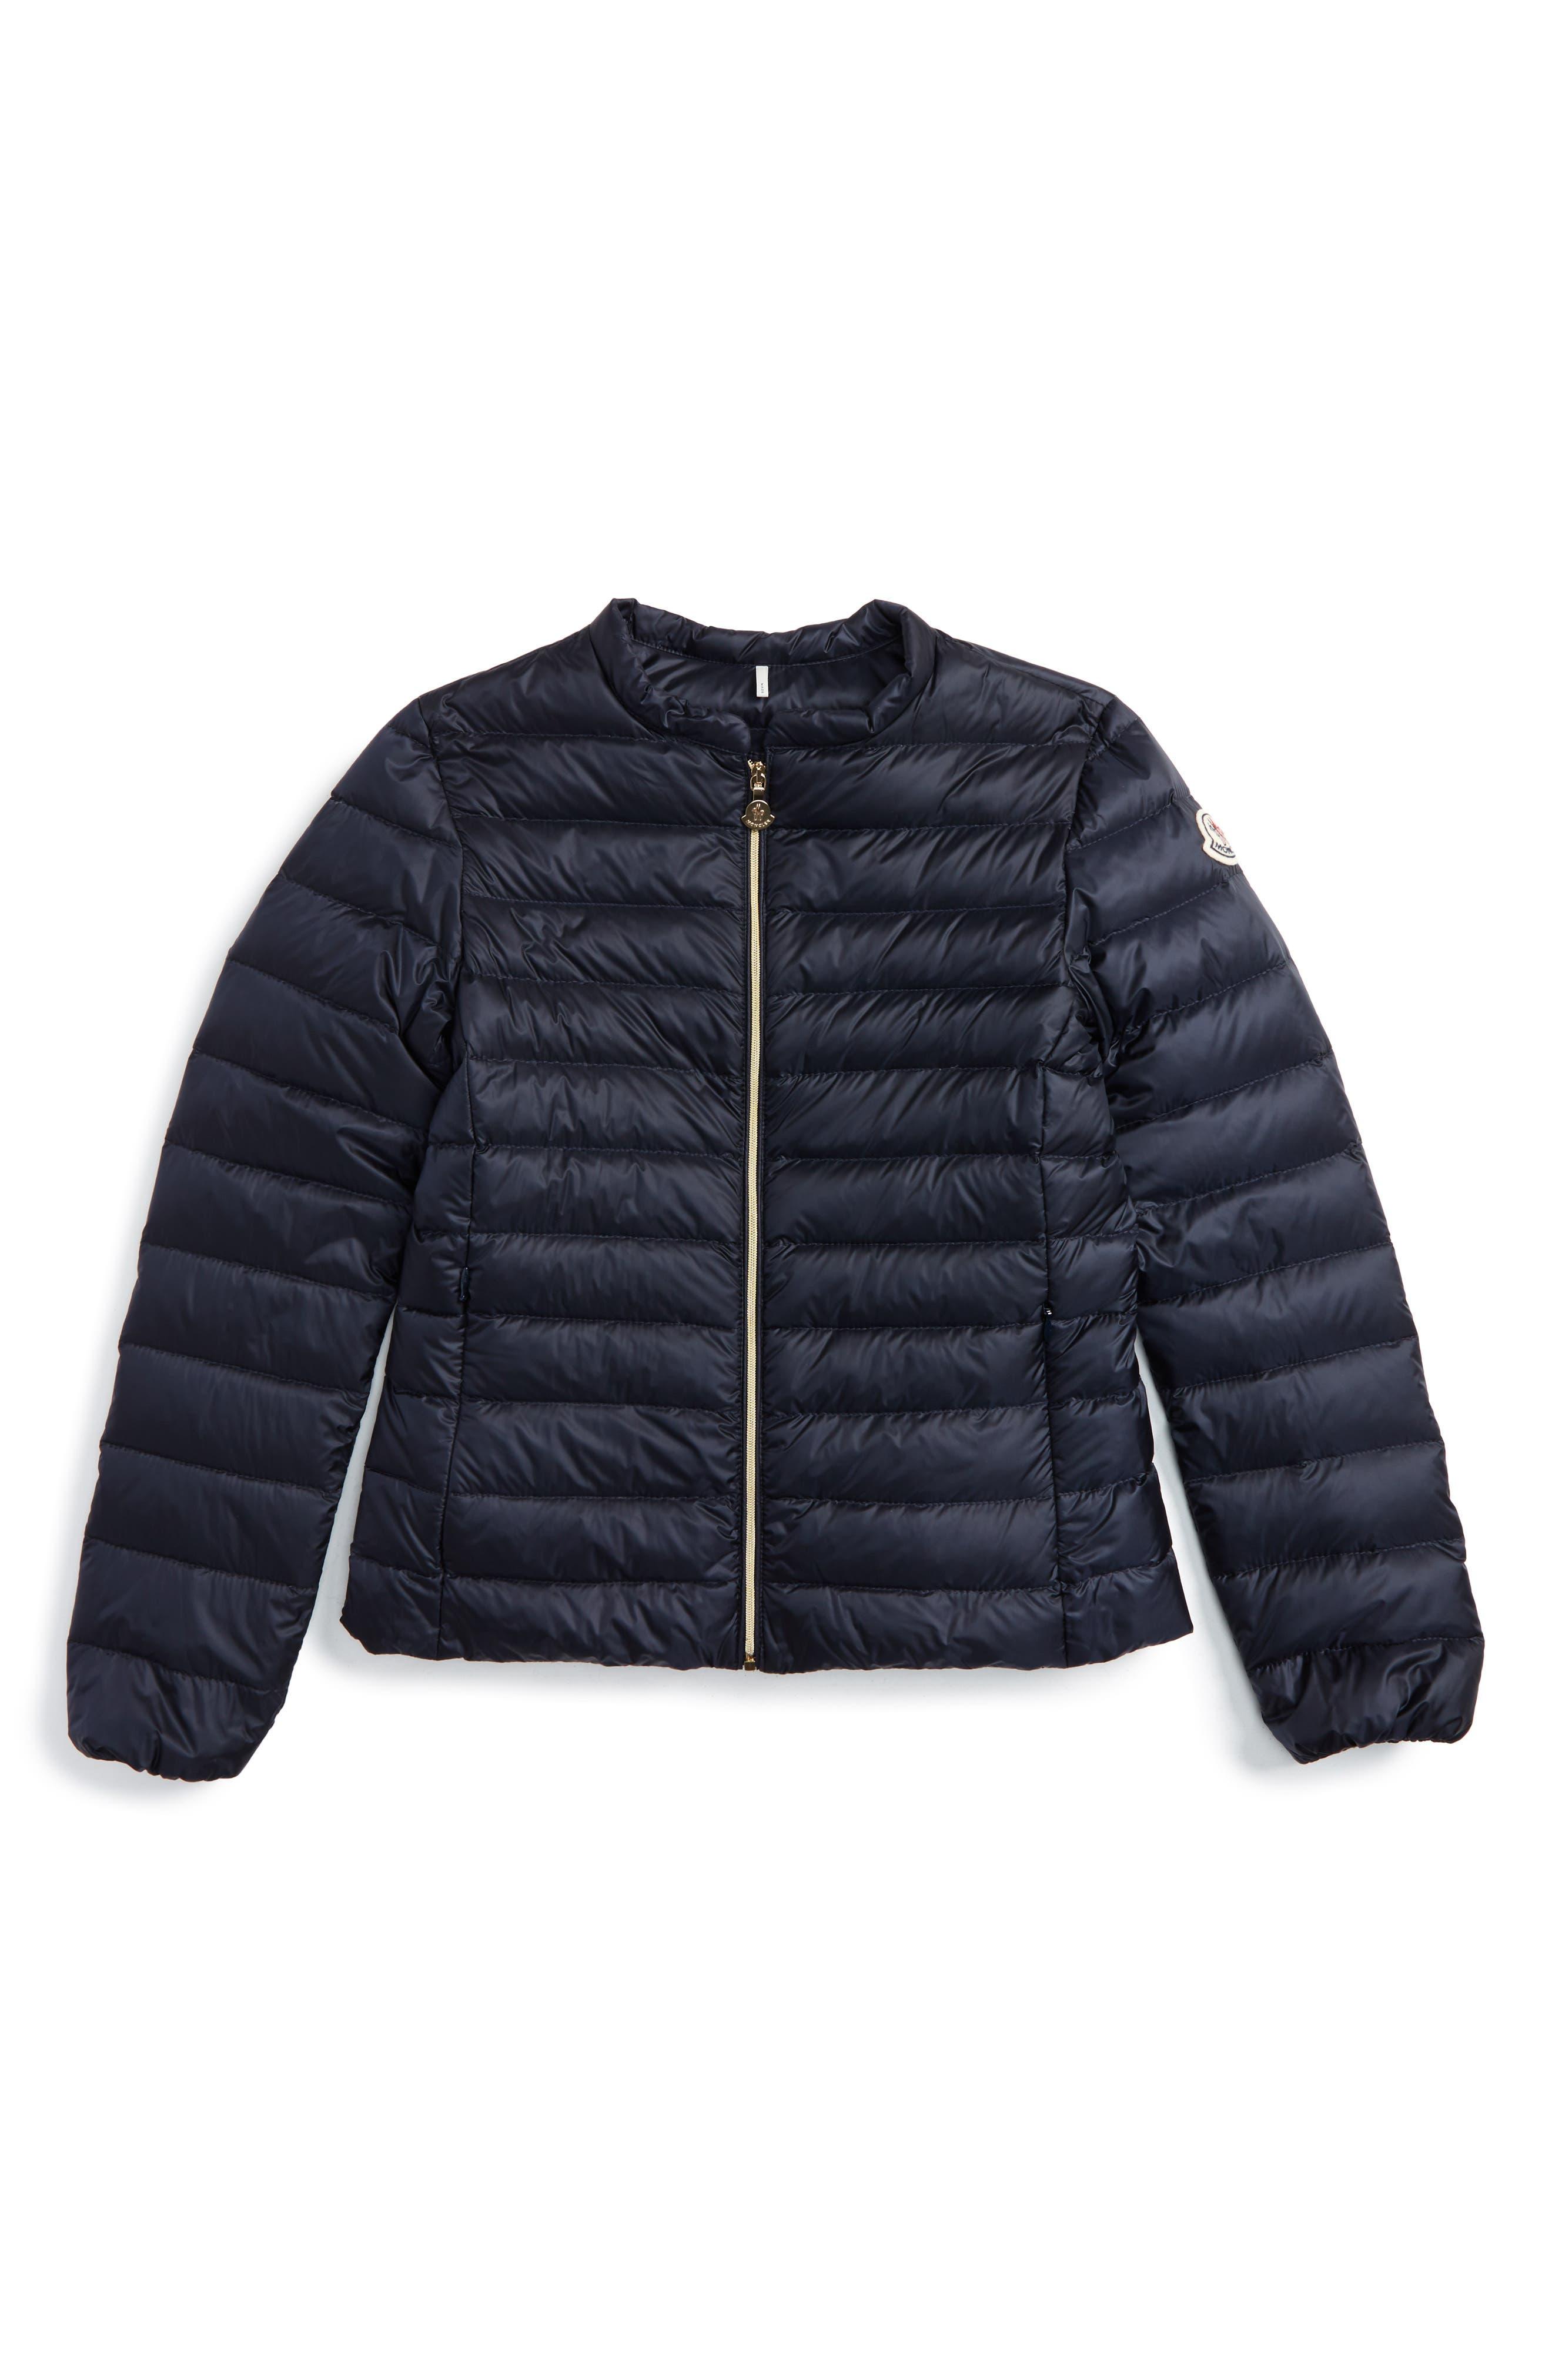 Main Image - Moncler Ambrine Water Resistant Down Jacket (Toddler, Little Kid & Big Kid)